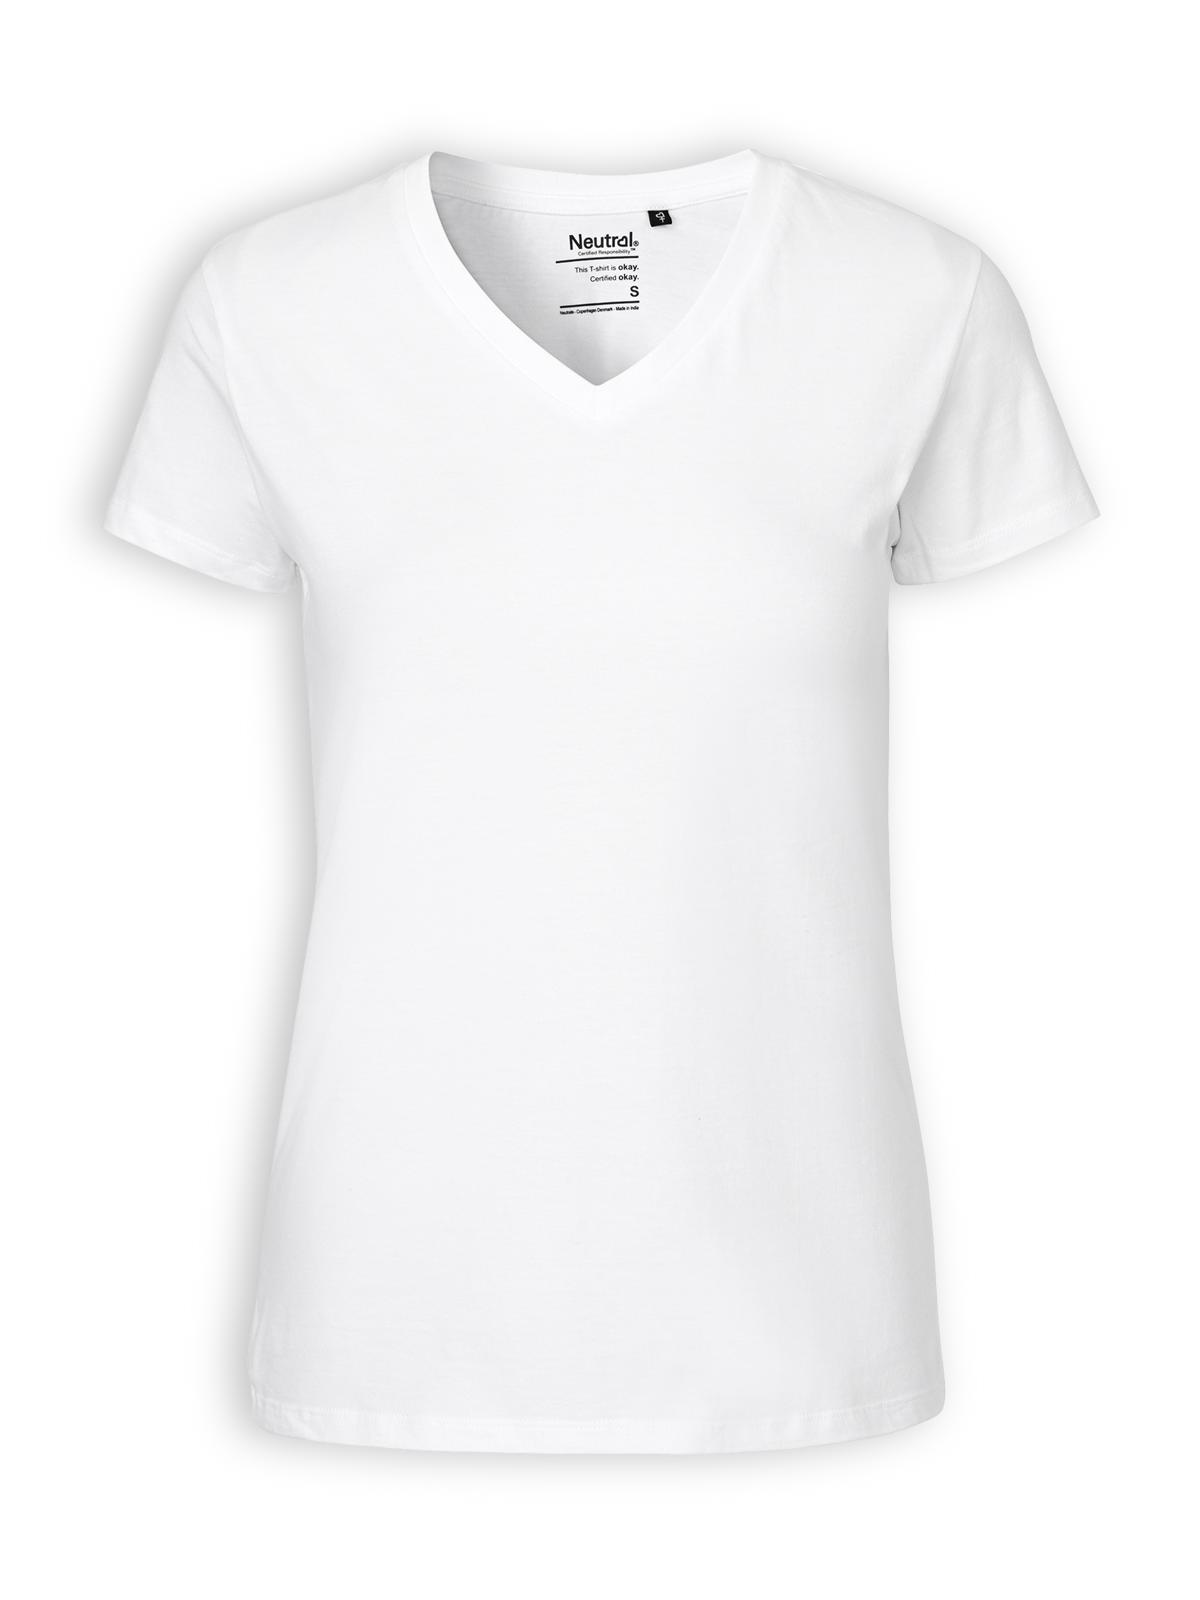 Neutral V-neck T-shirt in white. Zoom